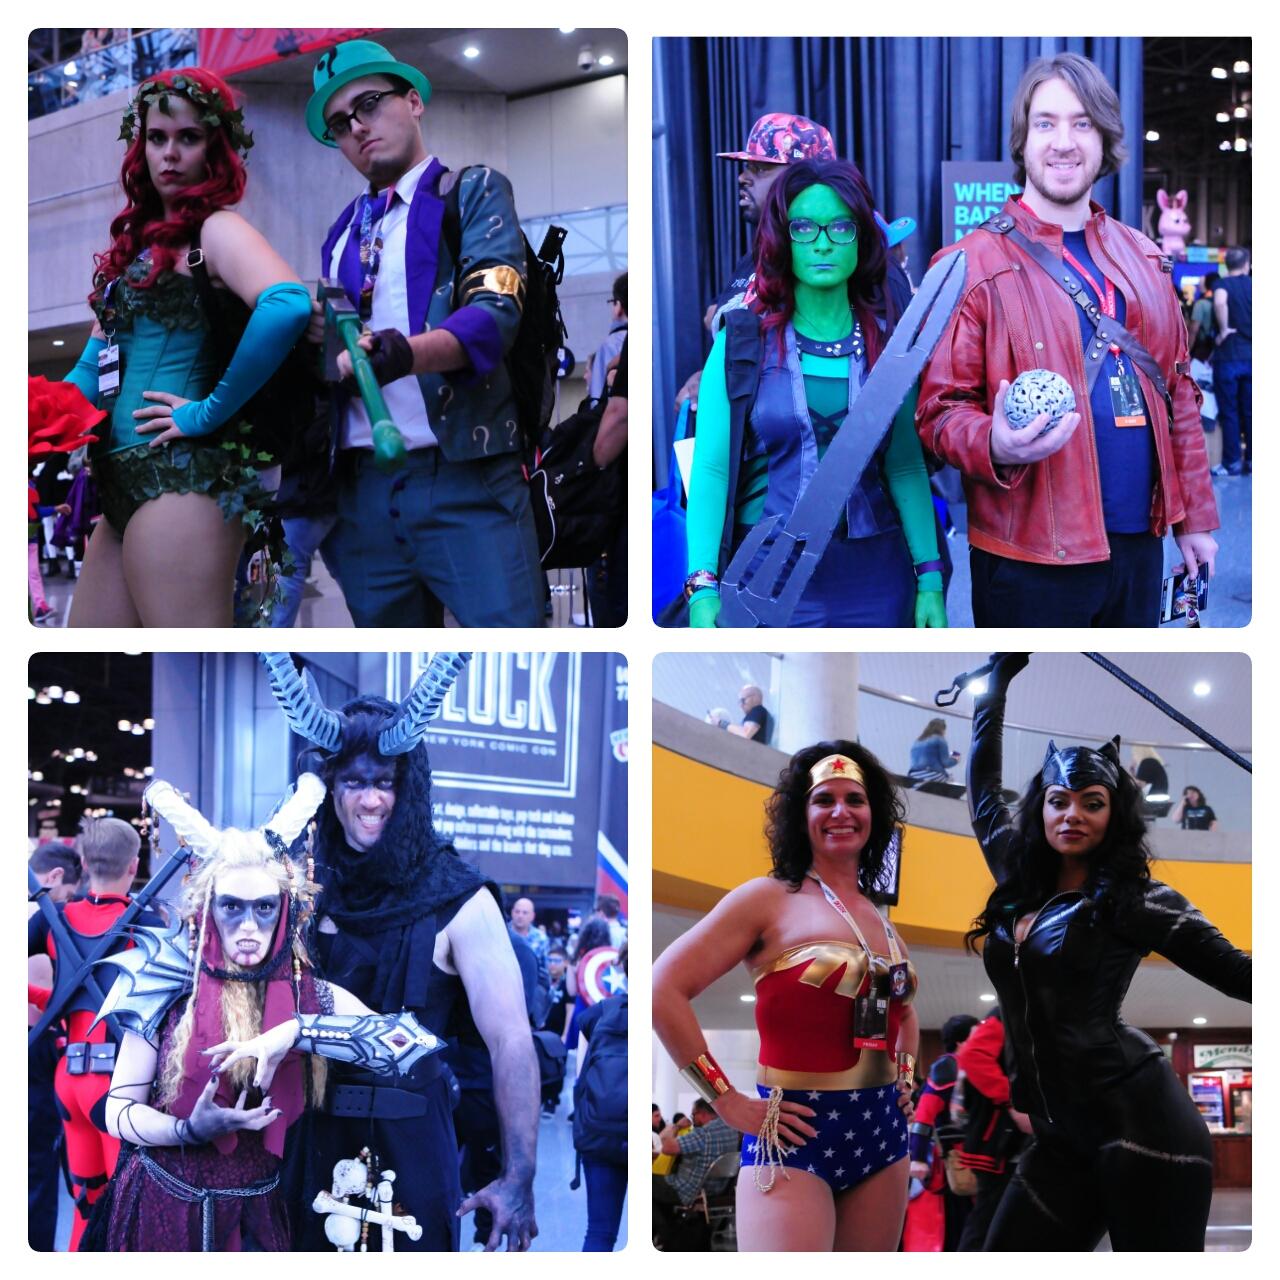 NYCC New York Comic Con Cosplay